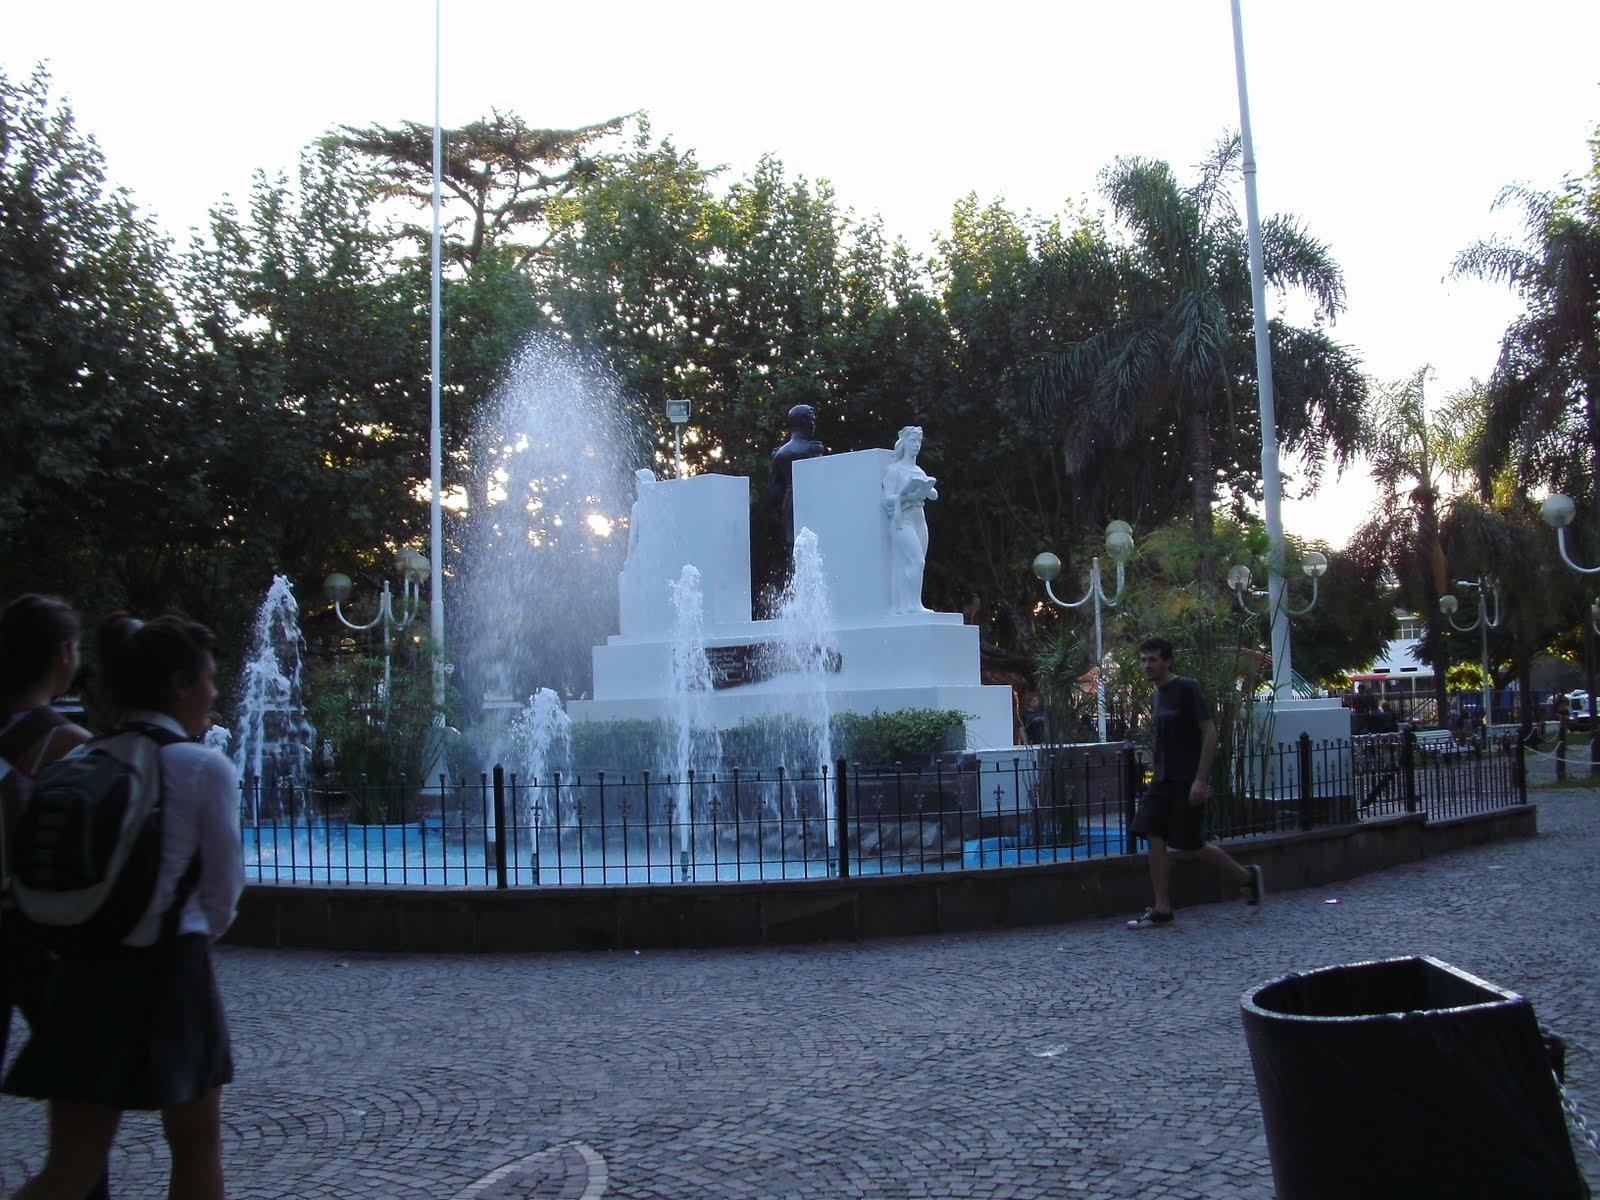 Elpueblodejosecpaz Plaza Manuel Belgrano Jose C Paz